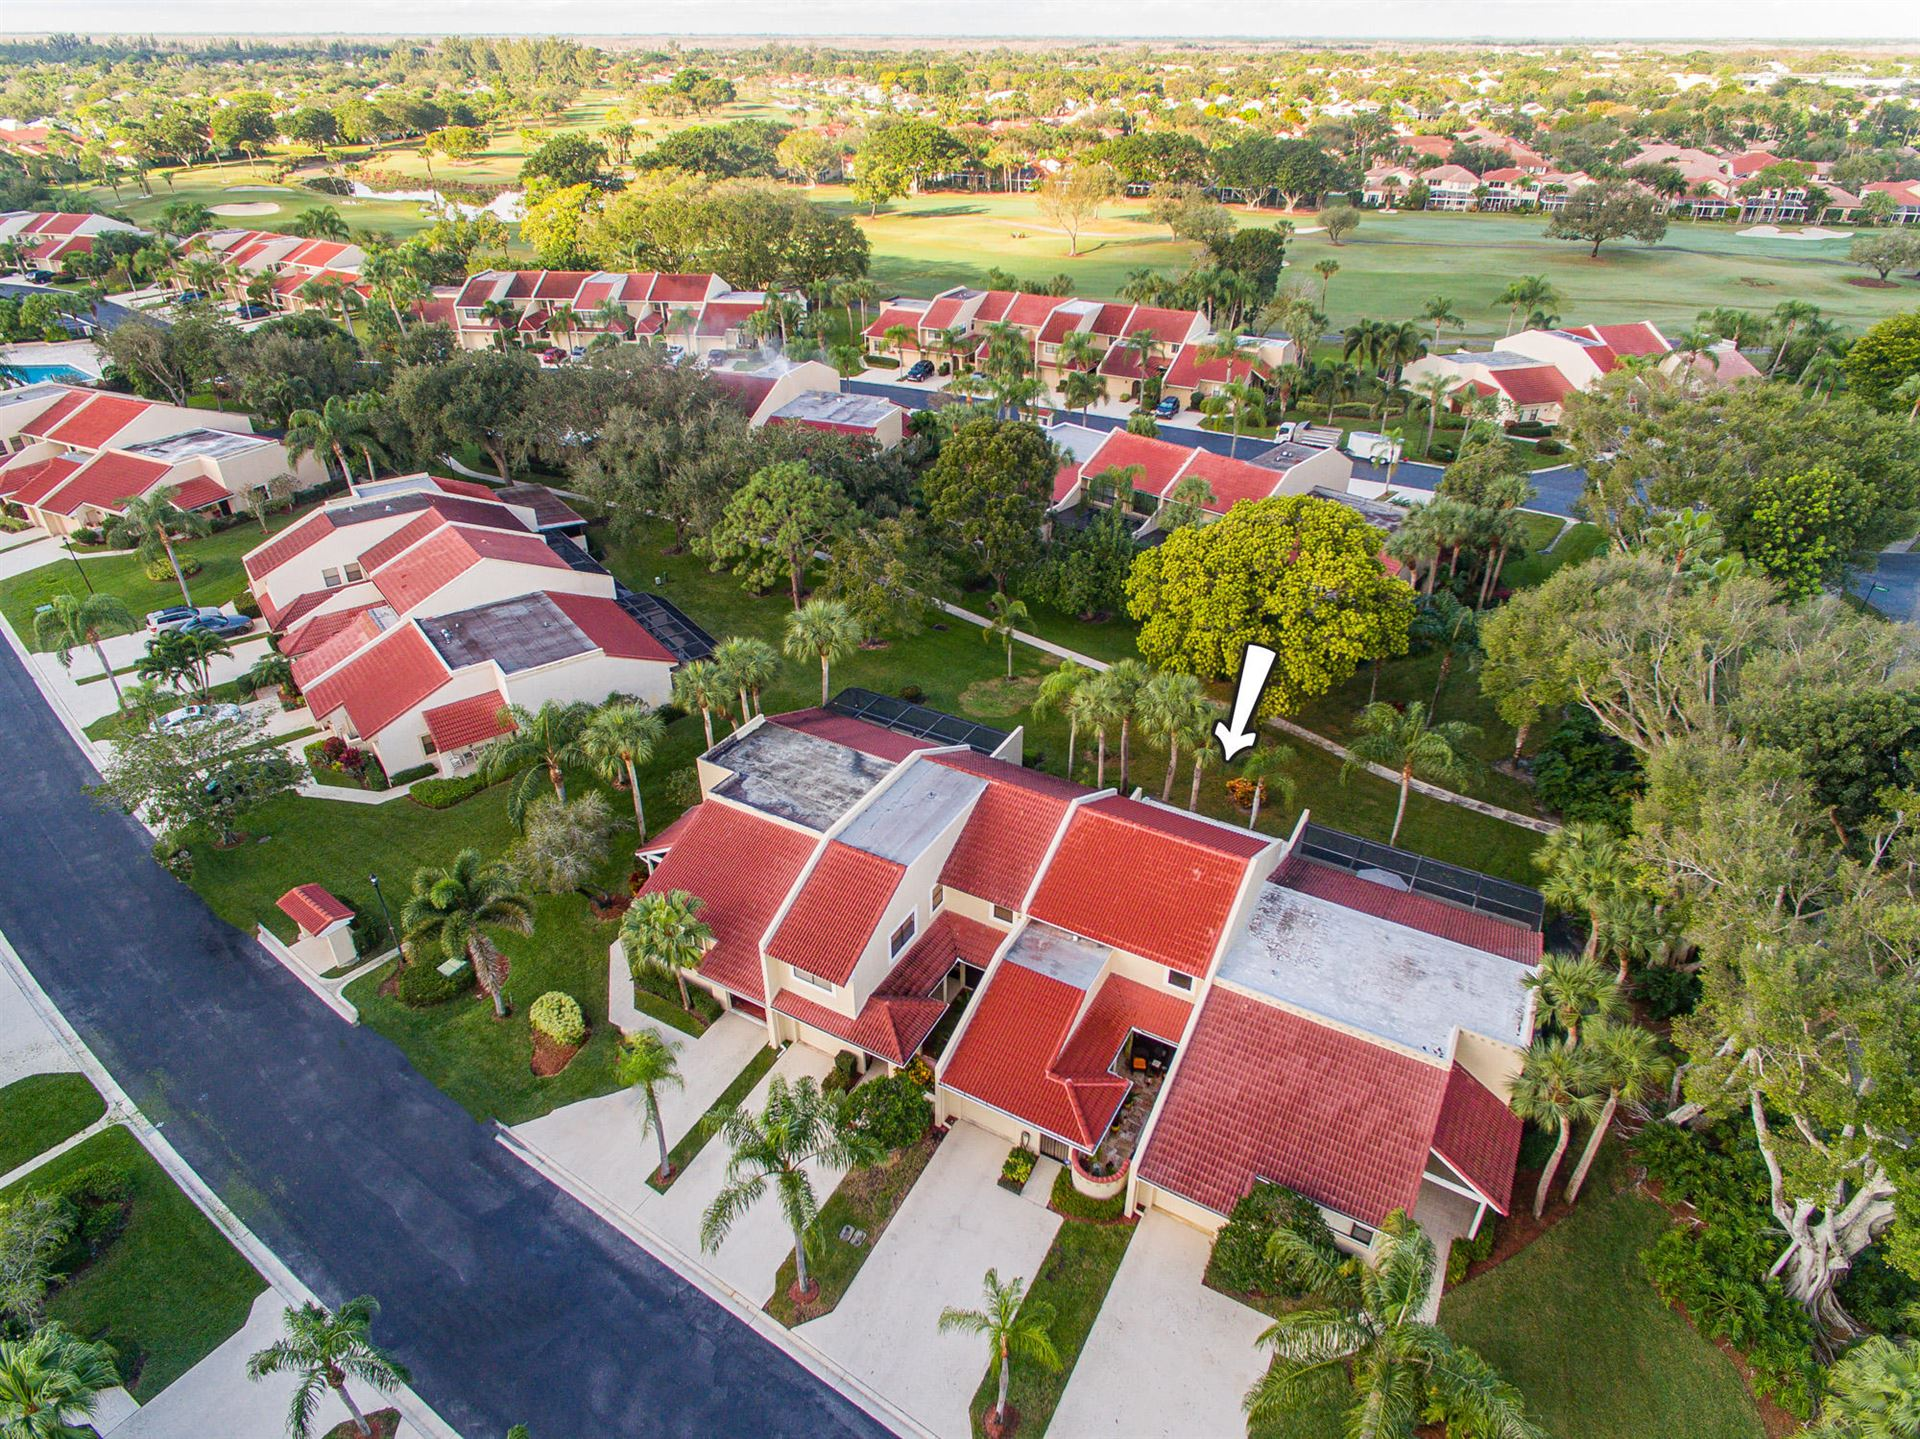 Photo of 807 Windermere Way, Palm Beach Gardens, FL 33418 (MLS # RX-10653457)